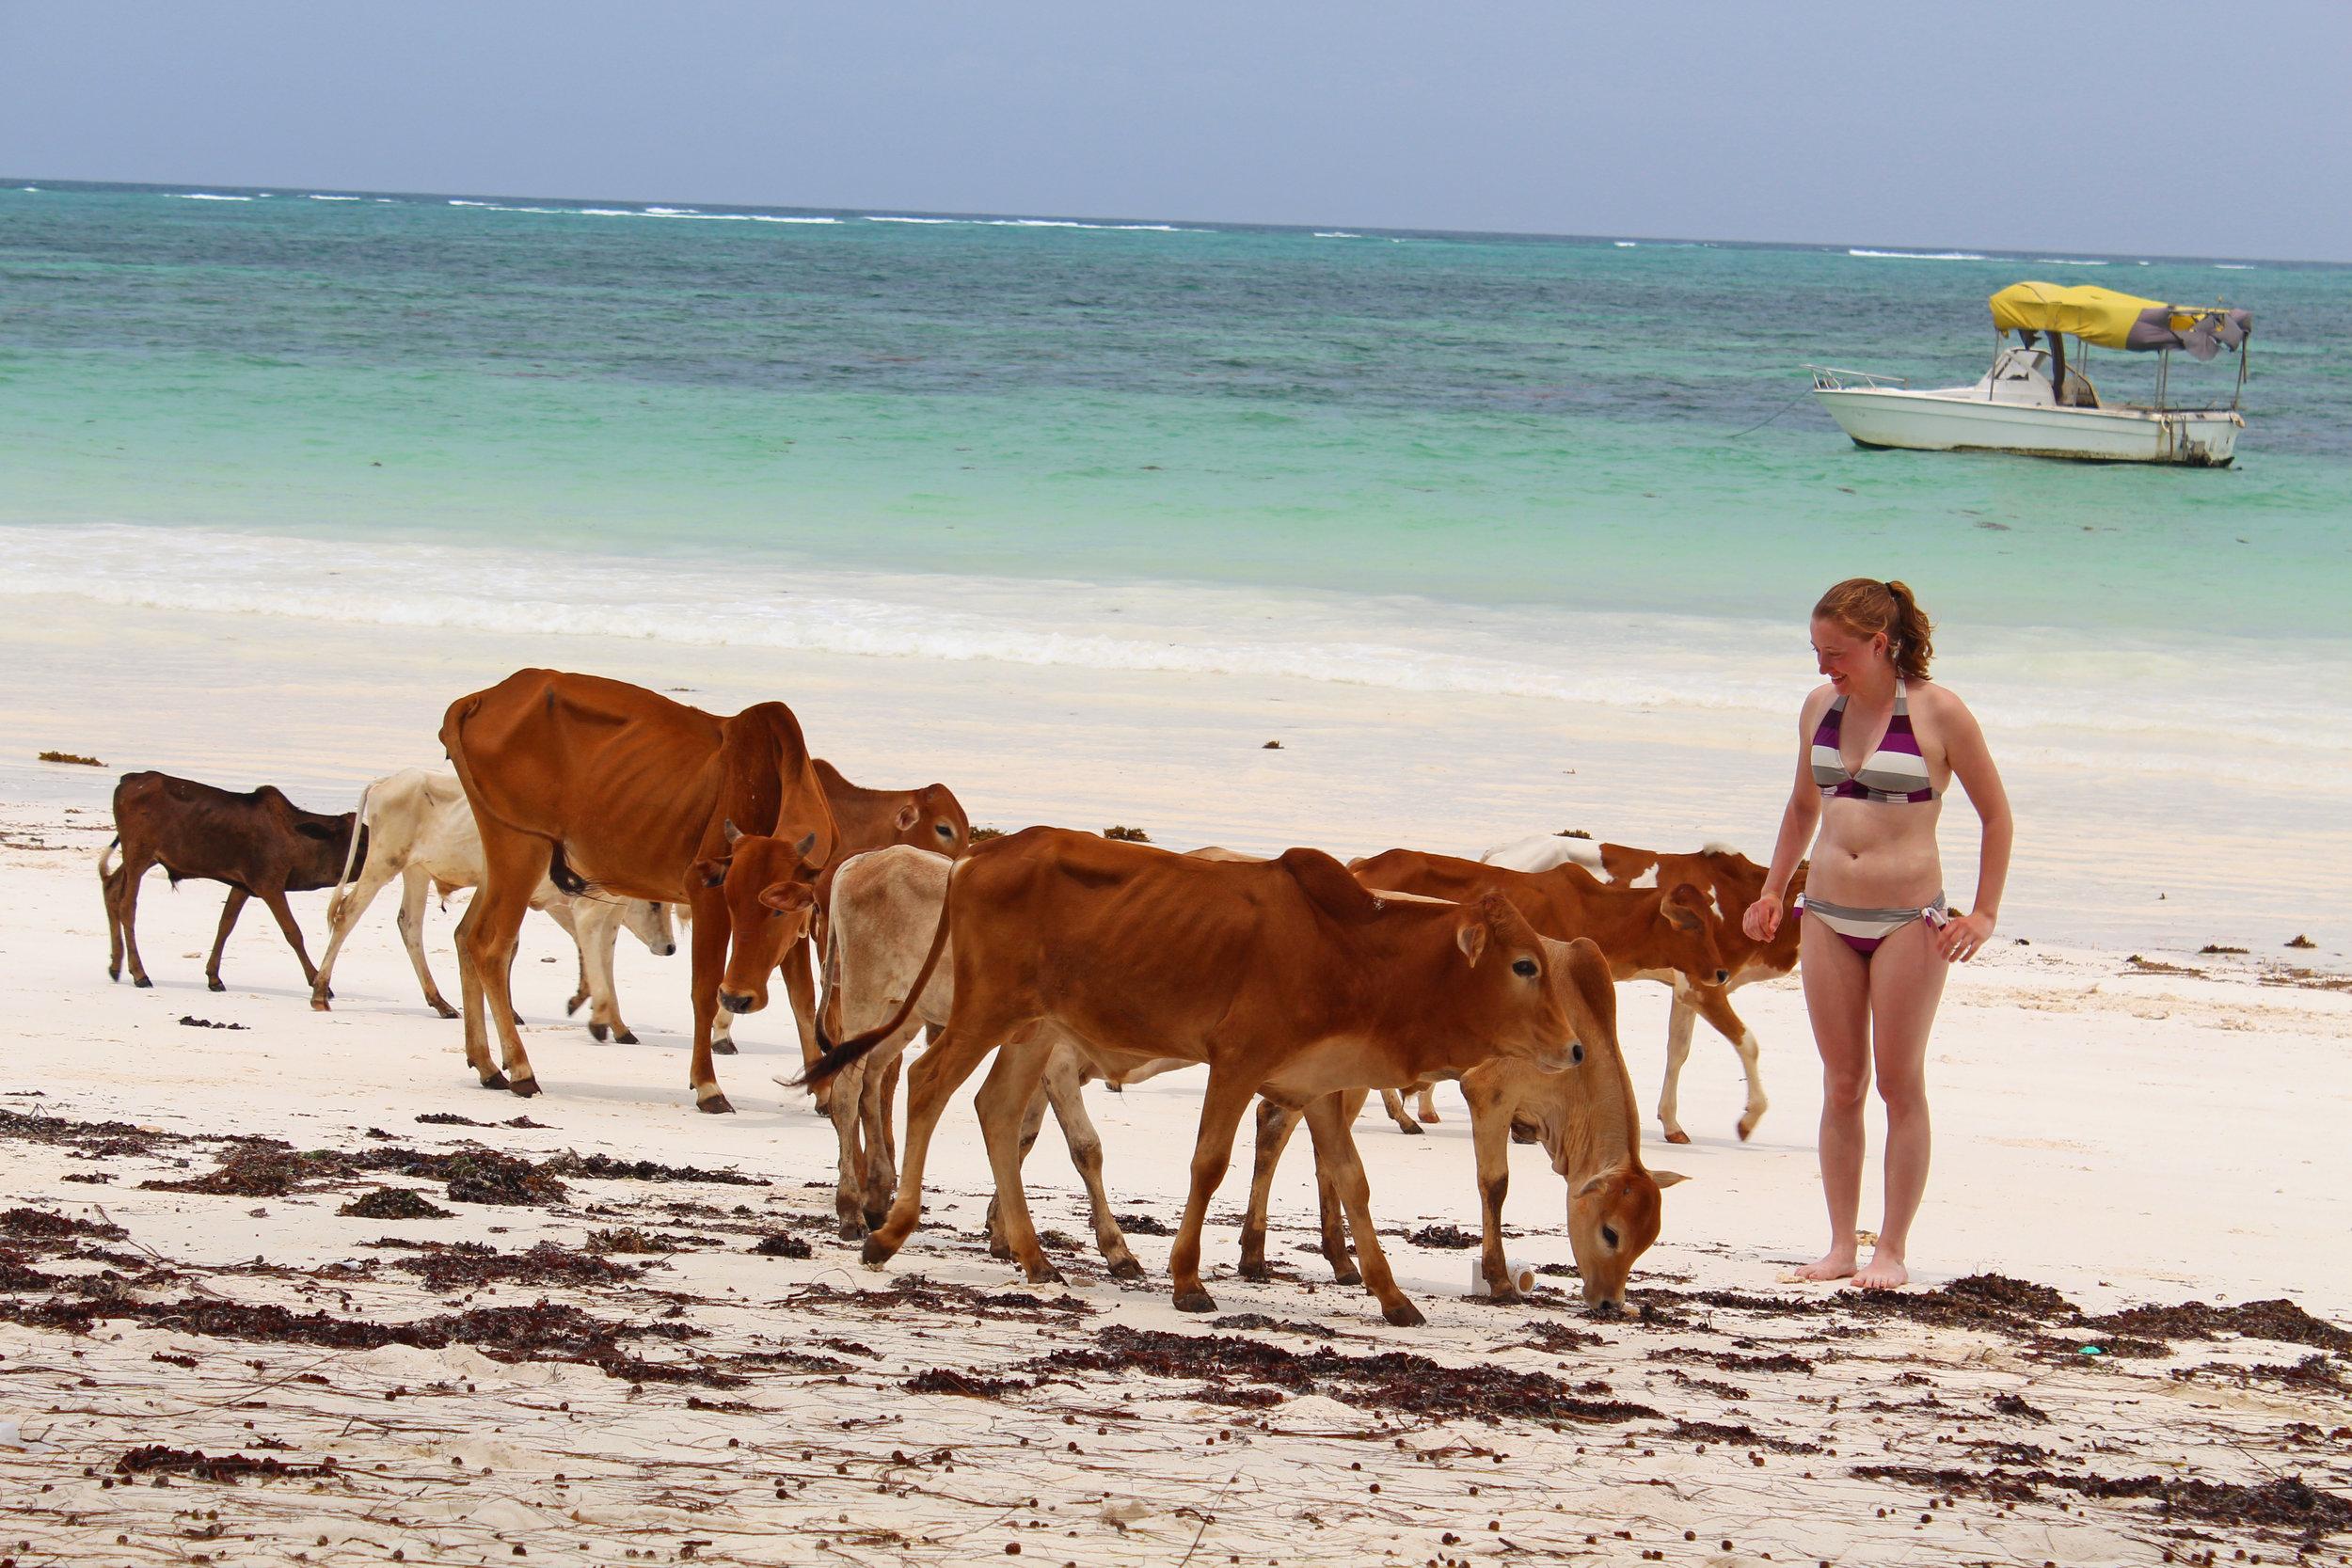 Herd of cows on the beach in Kiwengwa, Zanzibar